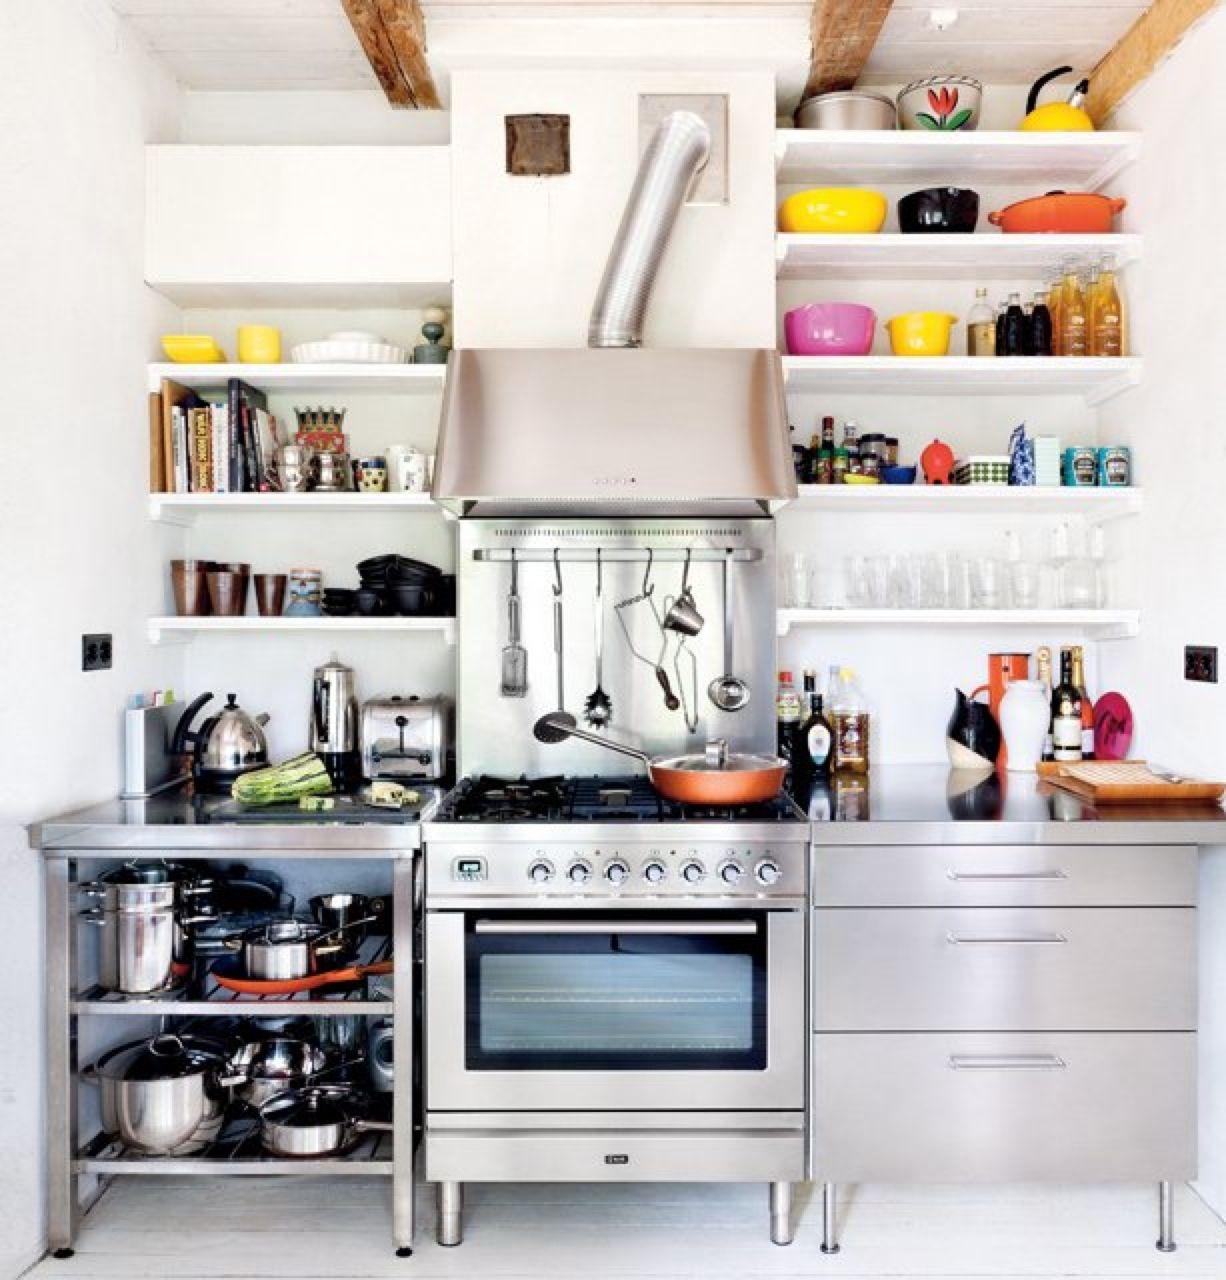 cucino? | cucina freestanding, arredamento, idee per la cucina